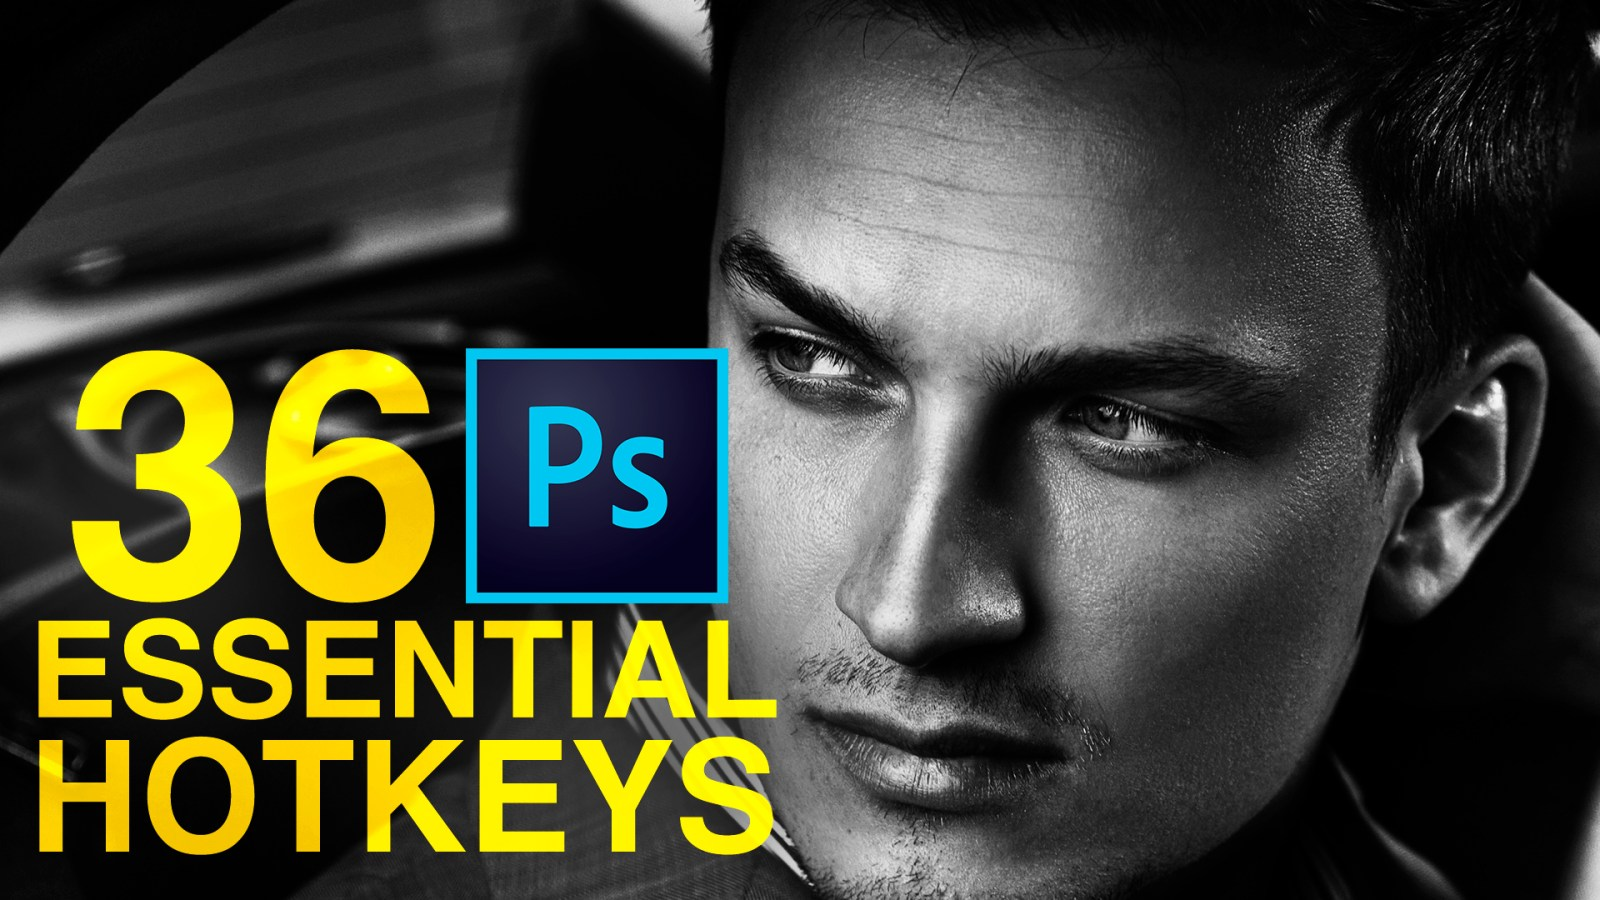 36-essential-hotkeys-photoshop-thumbnail